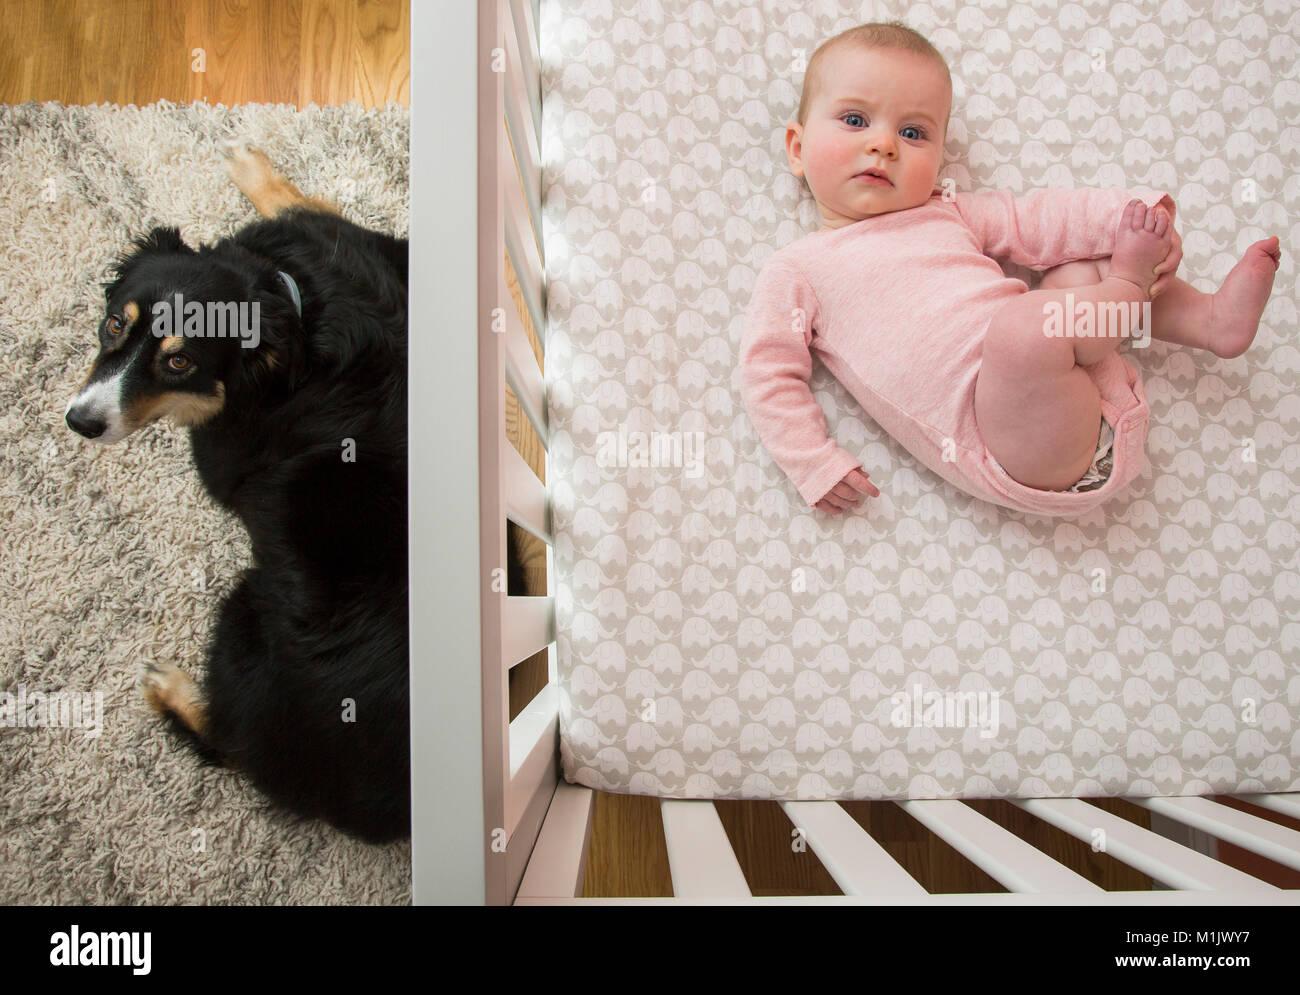 Crib Animal Stock Photos Amp Crib Animal Stock Images Alamy